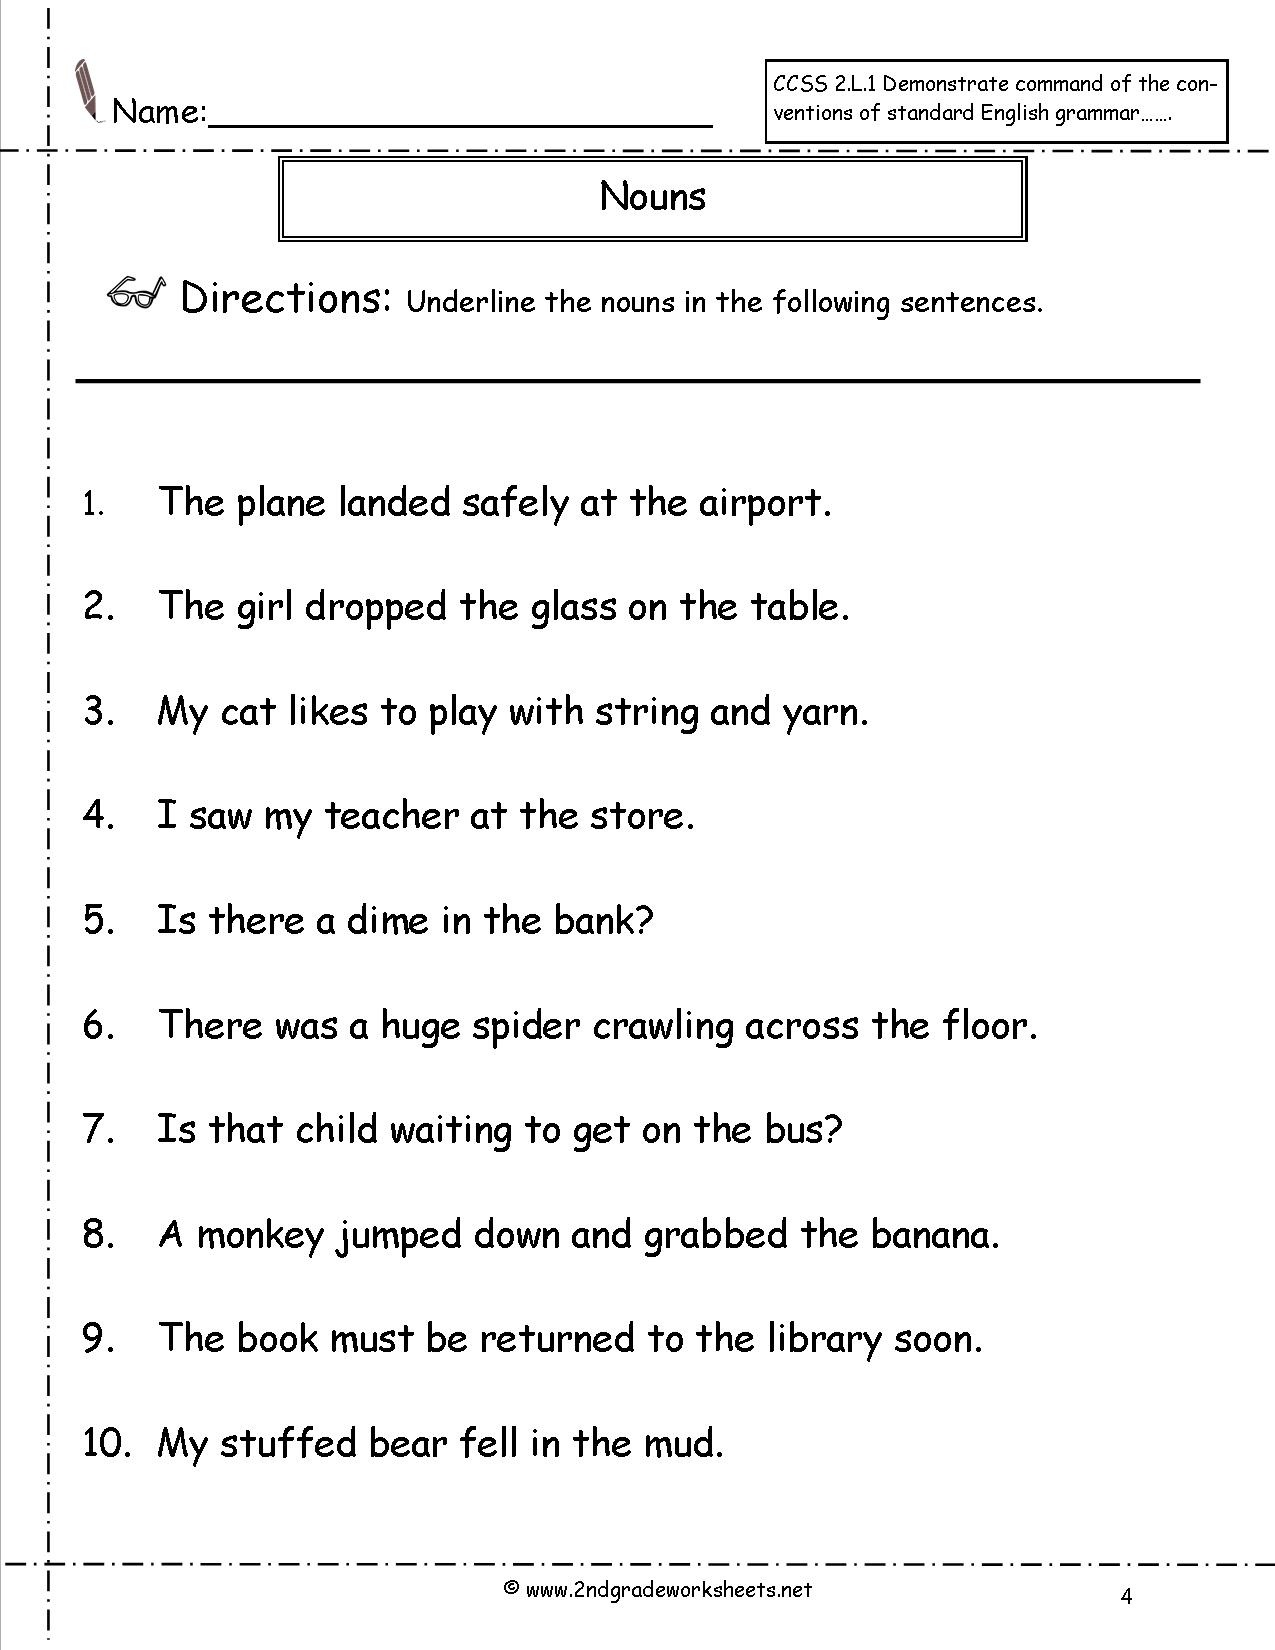 Nouns Worksheets And Printouts - Free Printable Pronoun Worksheets For 2Nd Grade